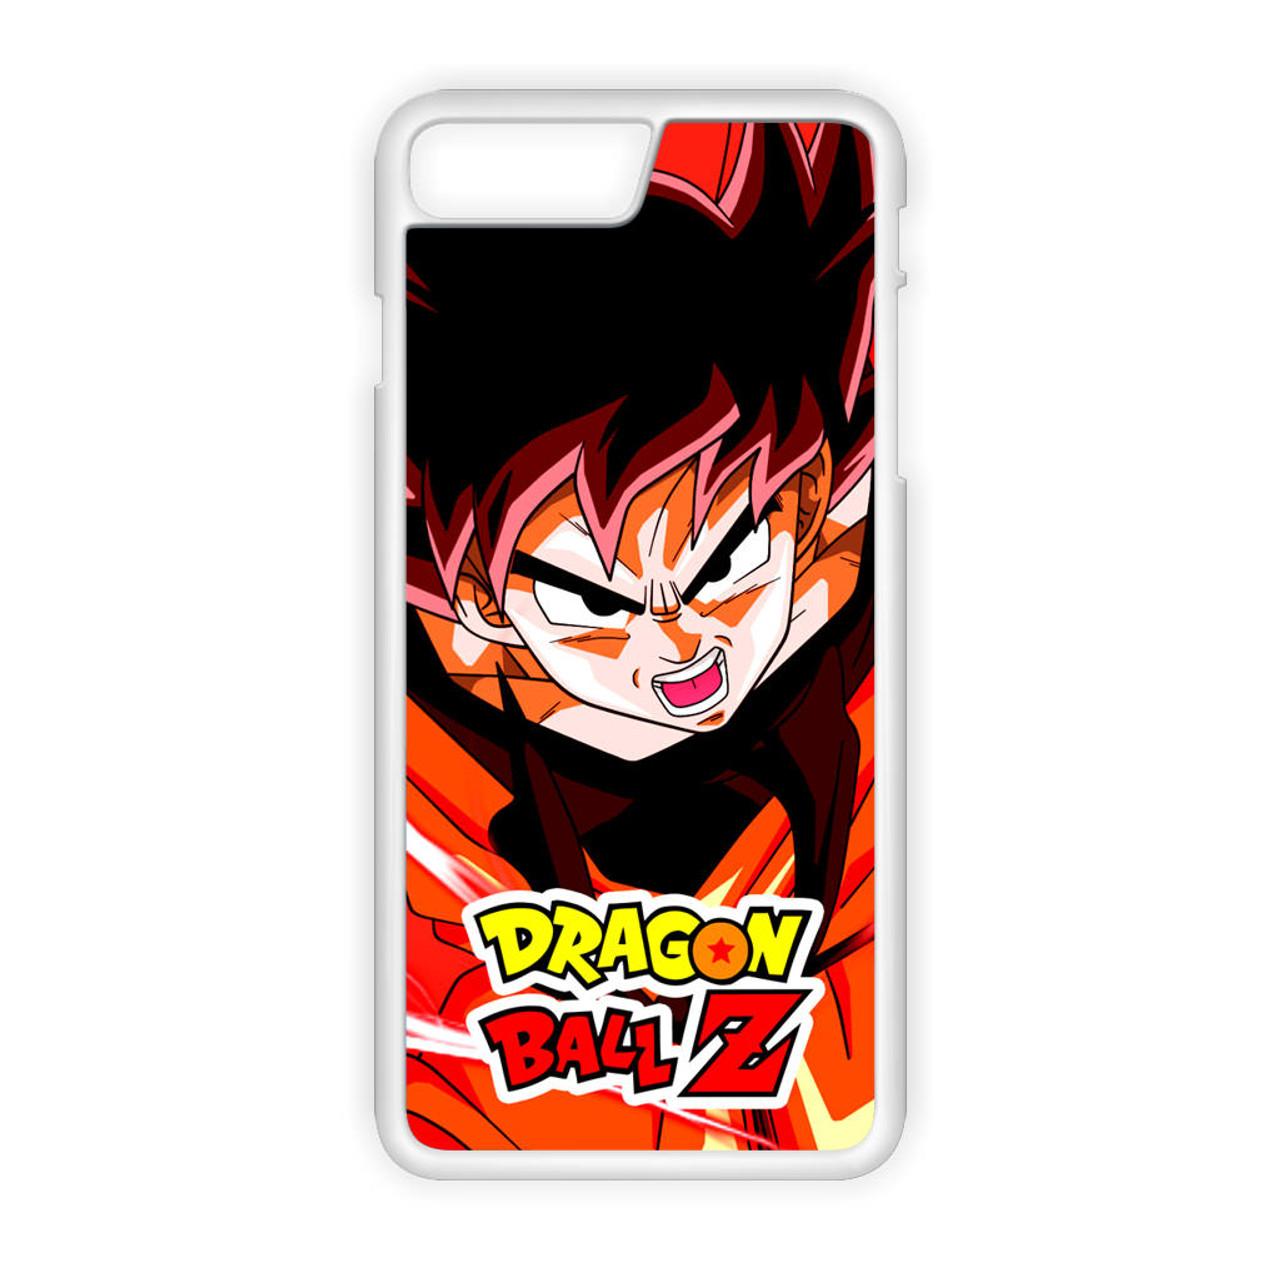 dragon ball kid goku 2 2 iphone case